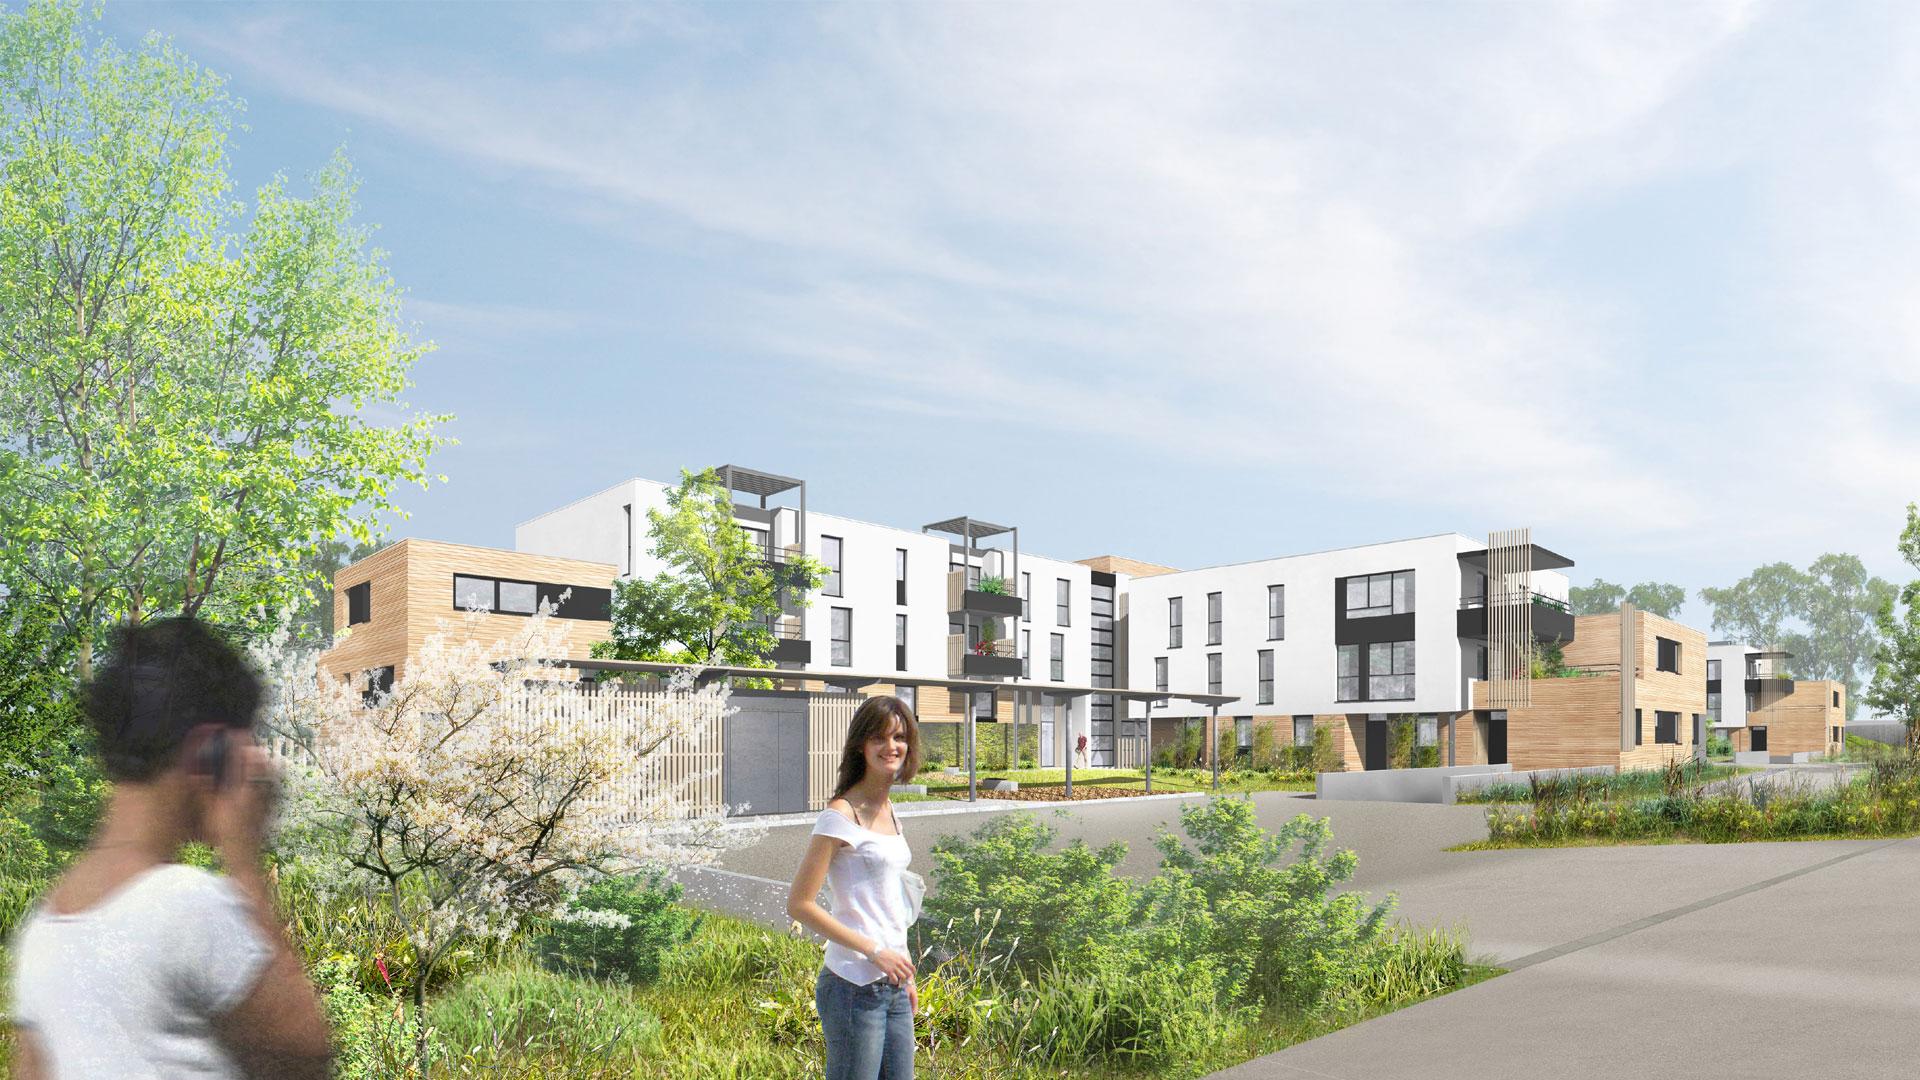 logements CUS Habitat à Lingolsheim - photo L. Matagne